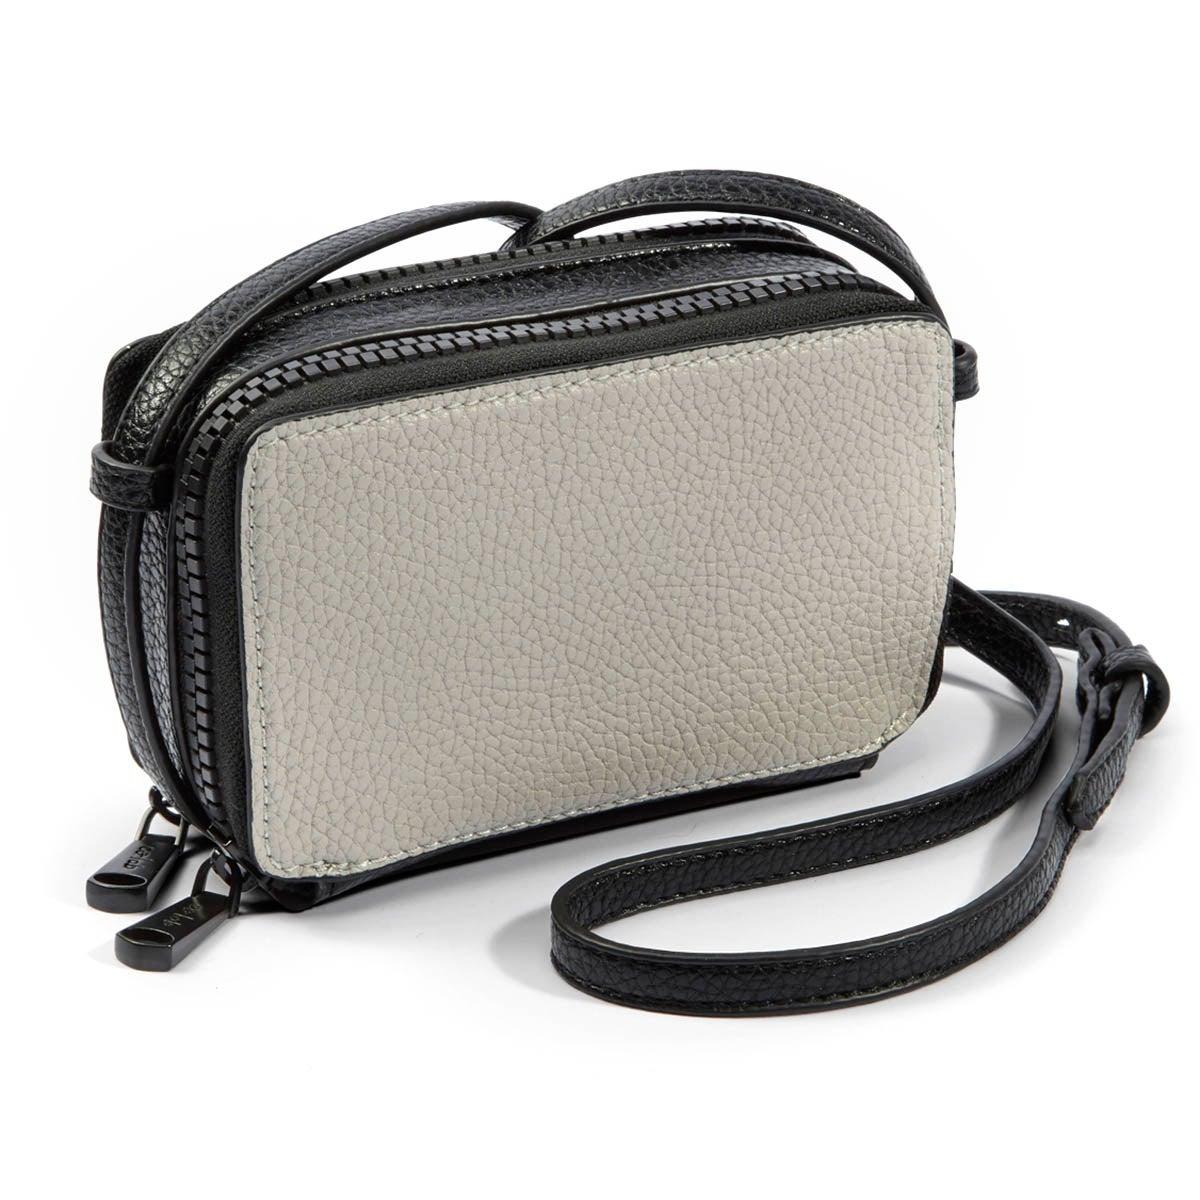 Lds Suzie blk/bone mini cross body bag